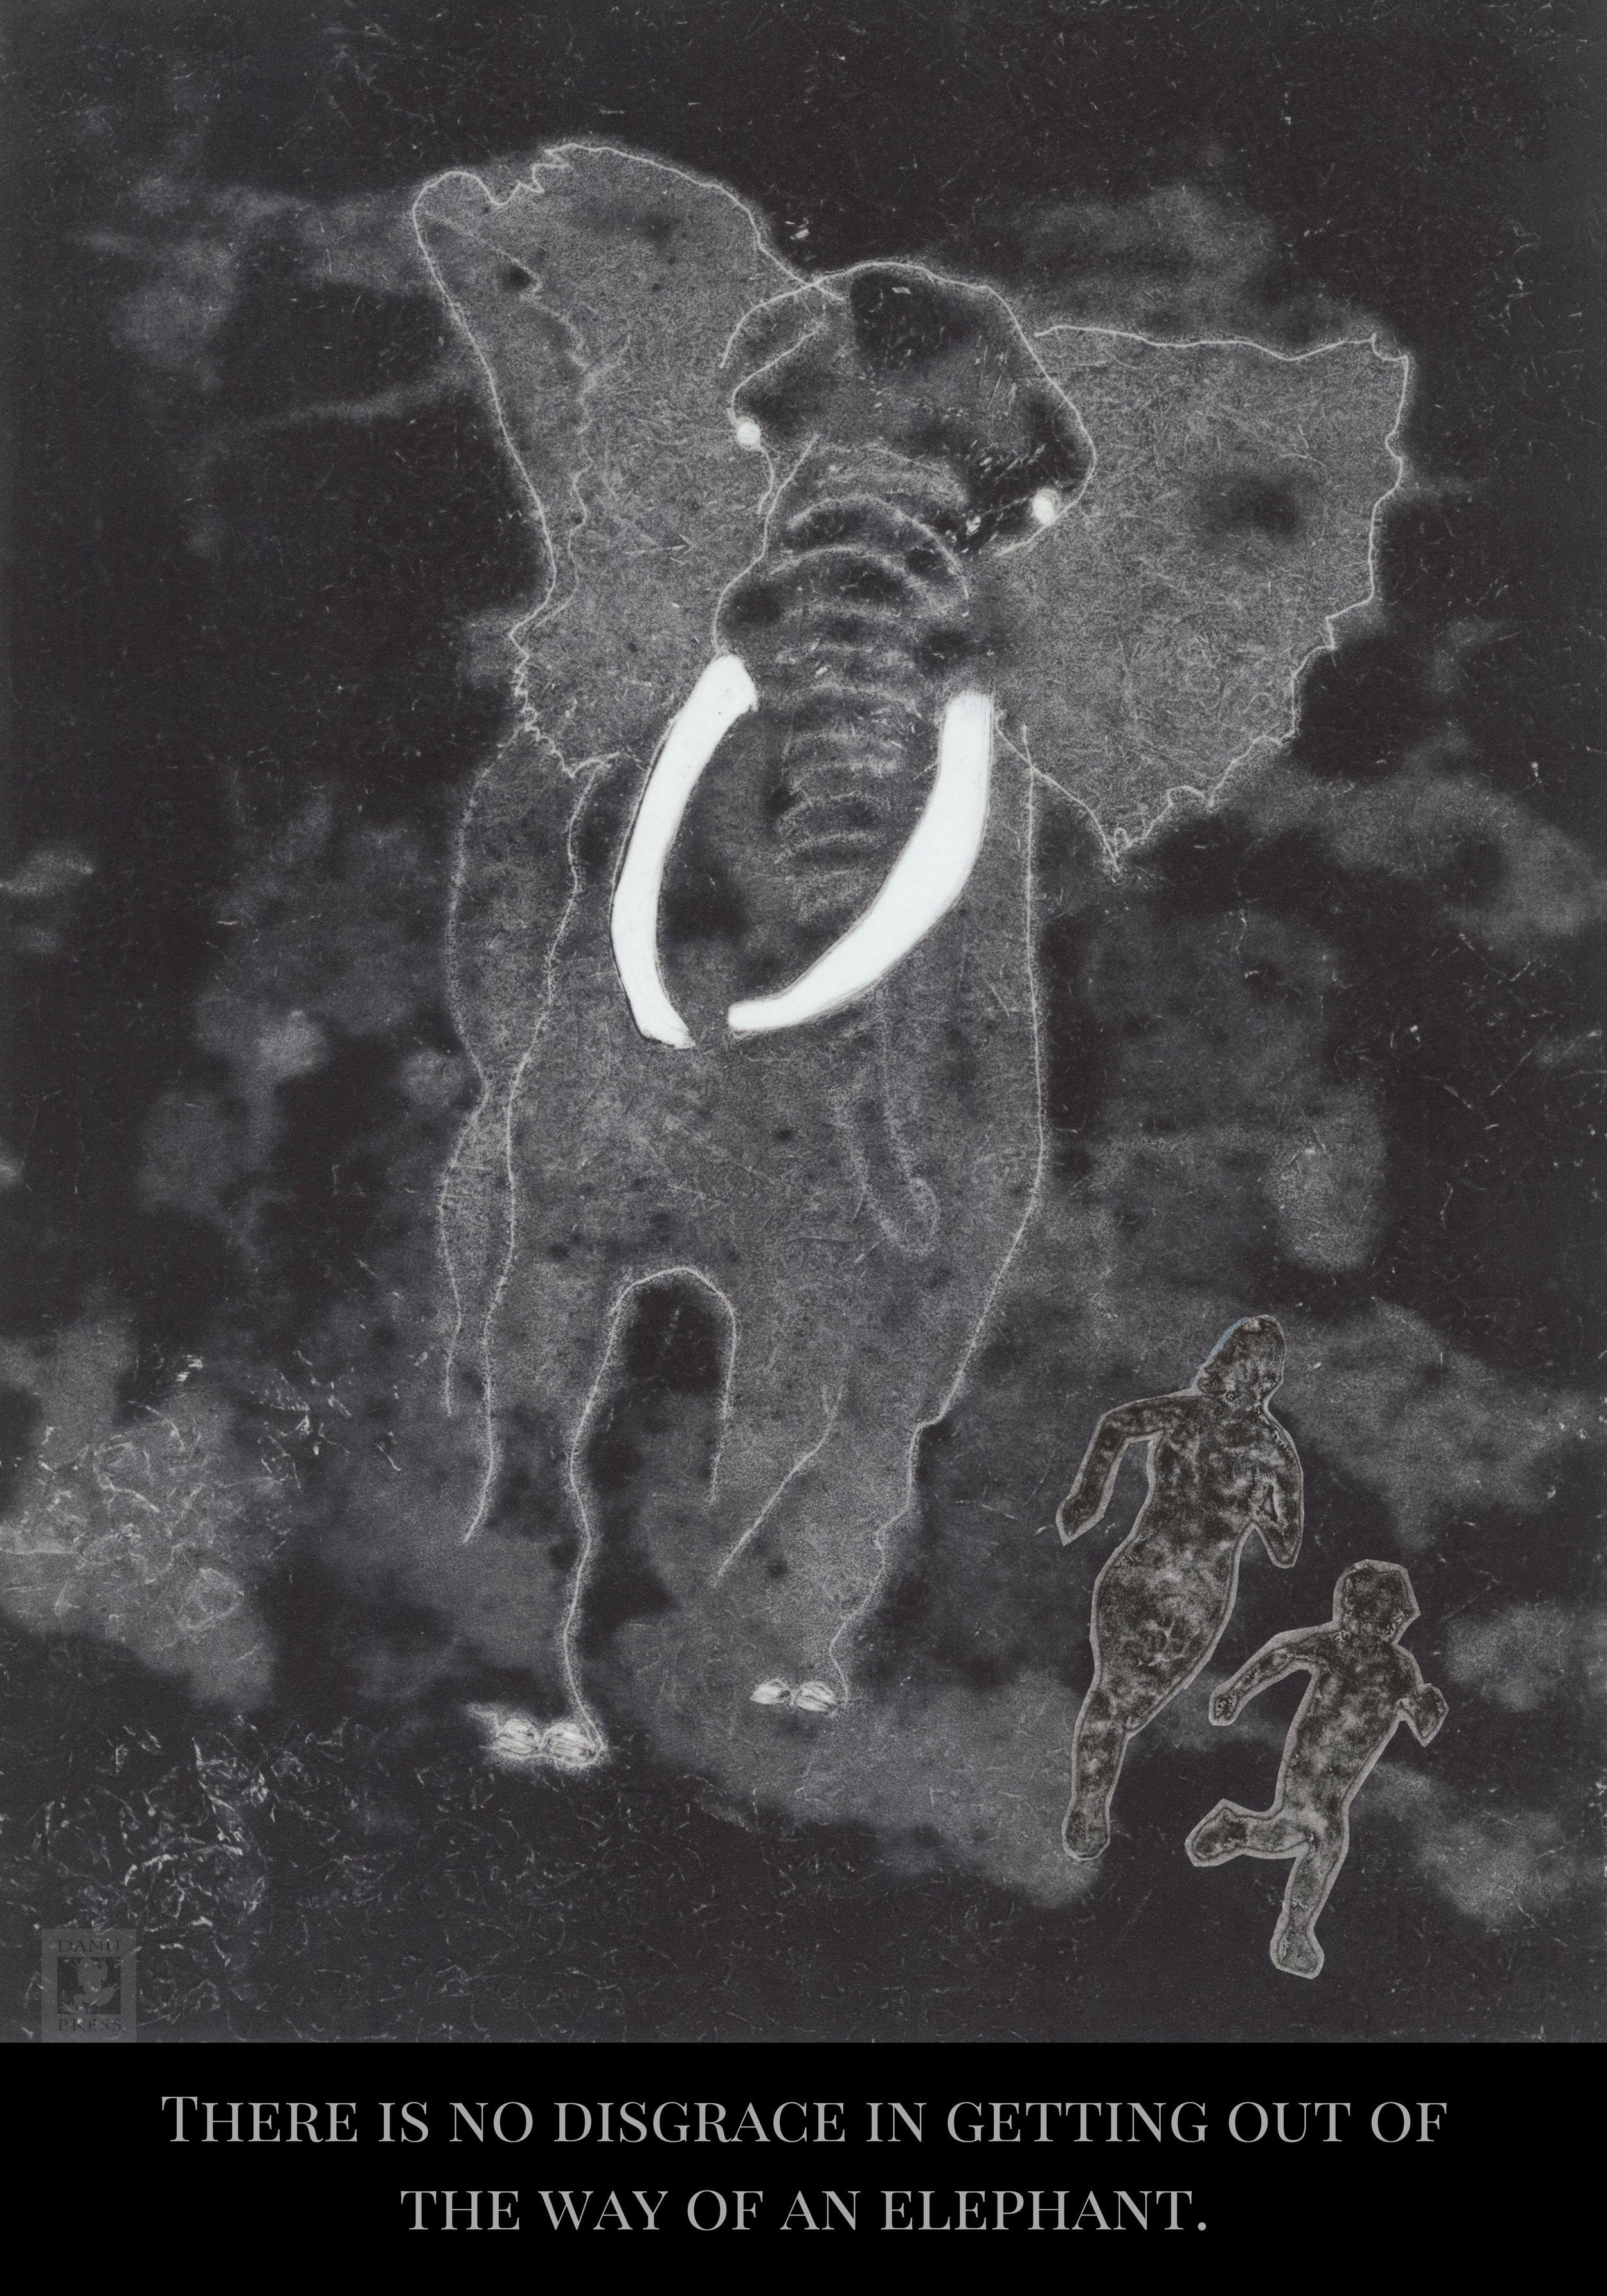 Elephant redbubble poster.jpg